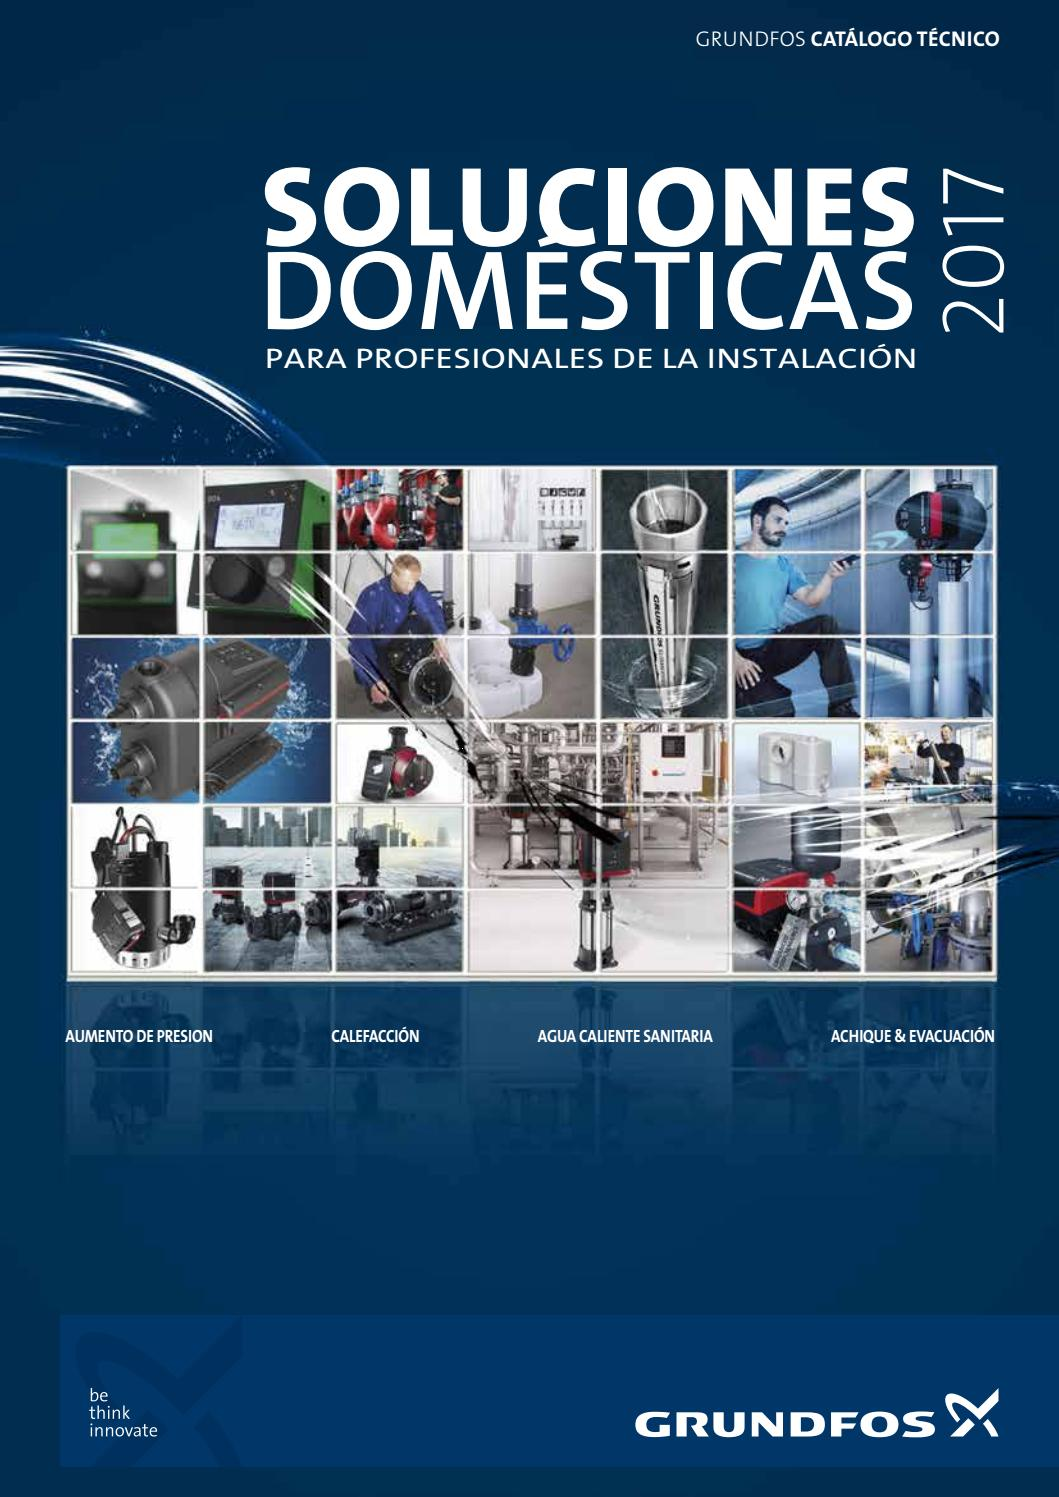 Soluciones dom sticas grundfos 2017 by elkoloqui issuu for Soluciones tecnico sanitarias